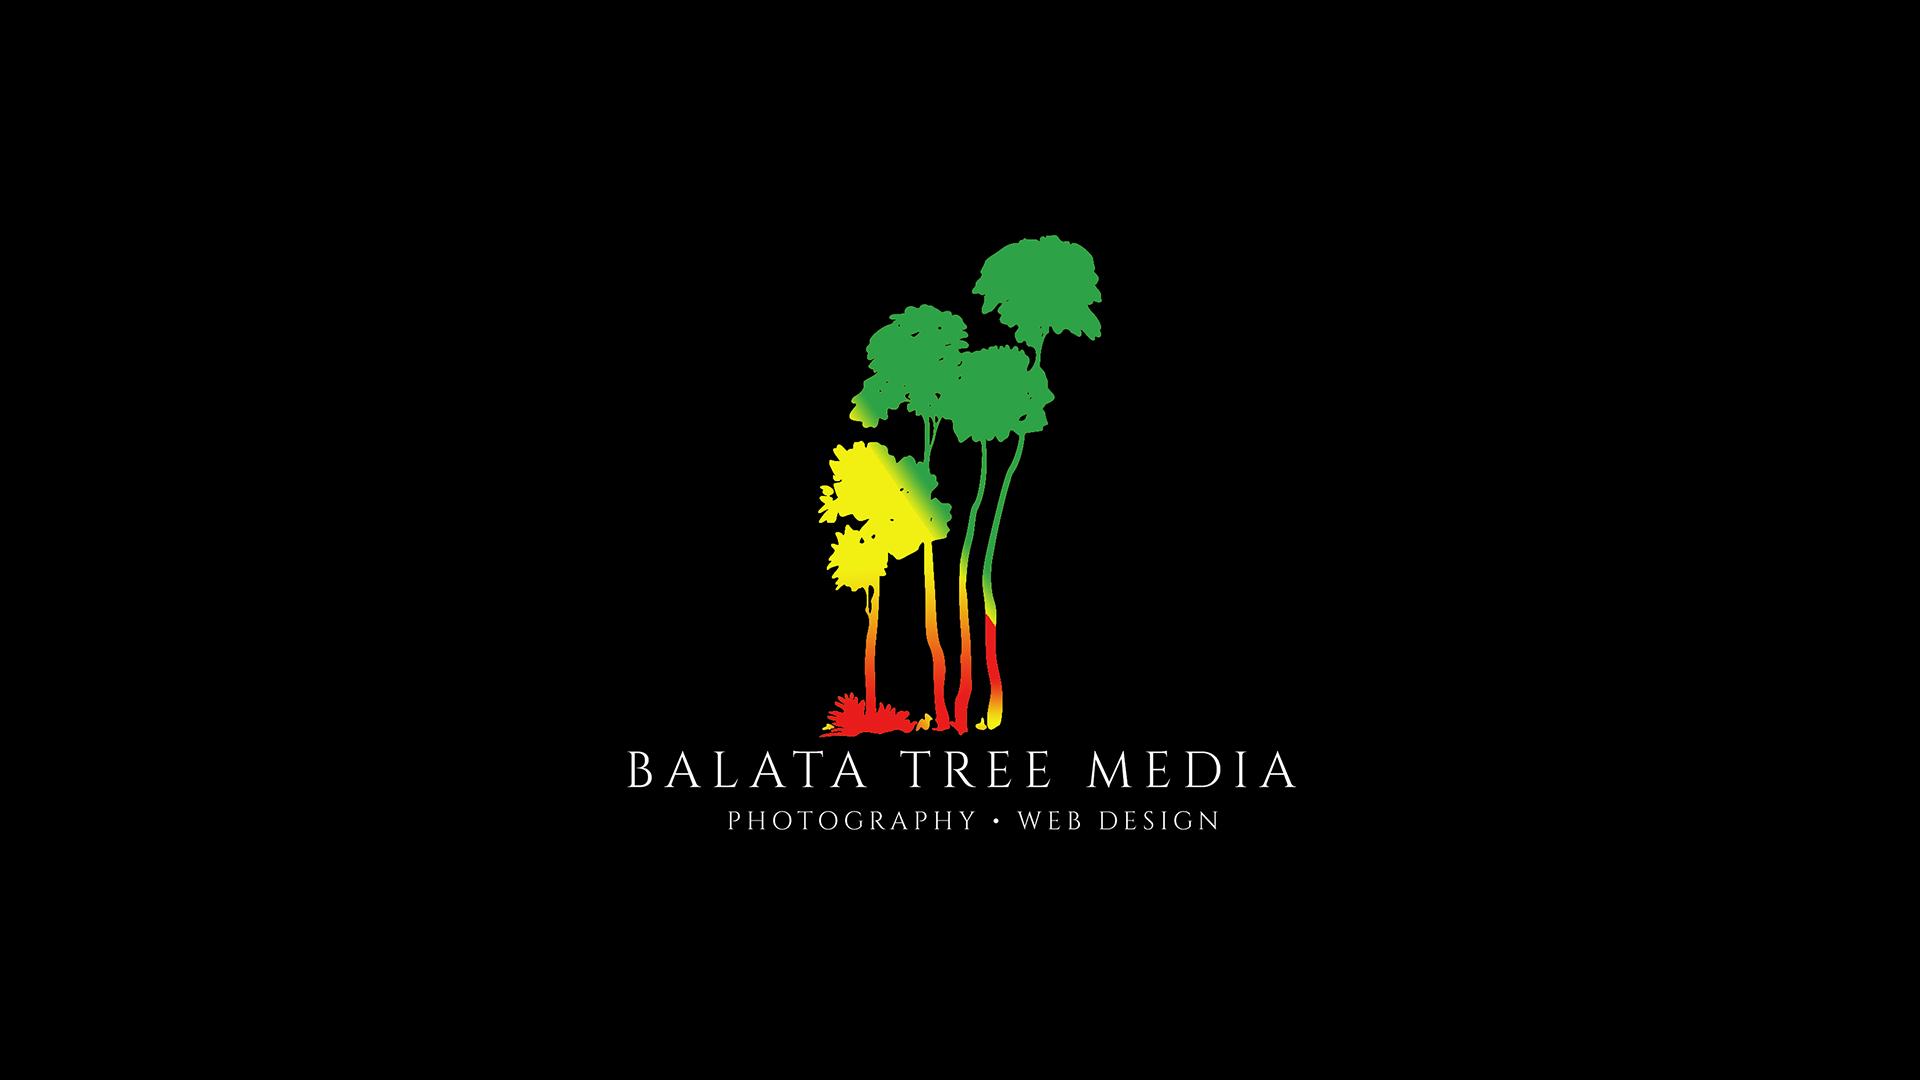 Balata Tree Media